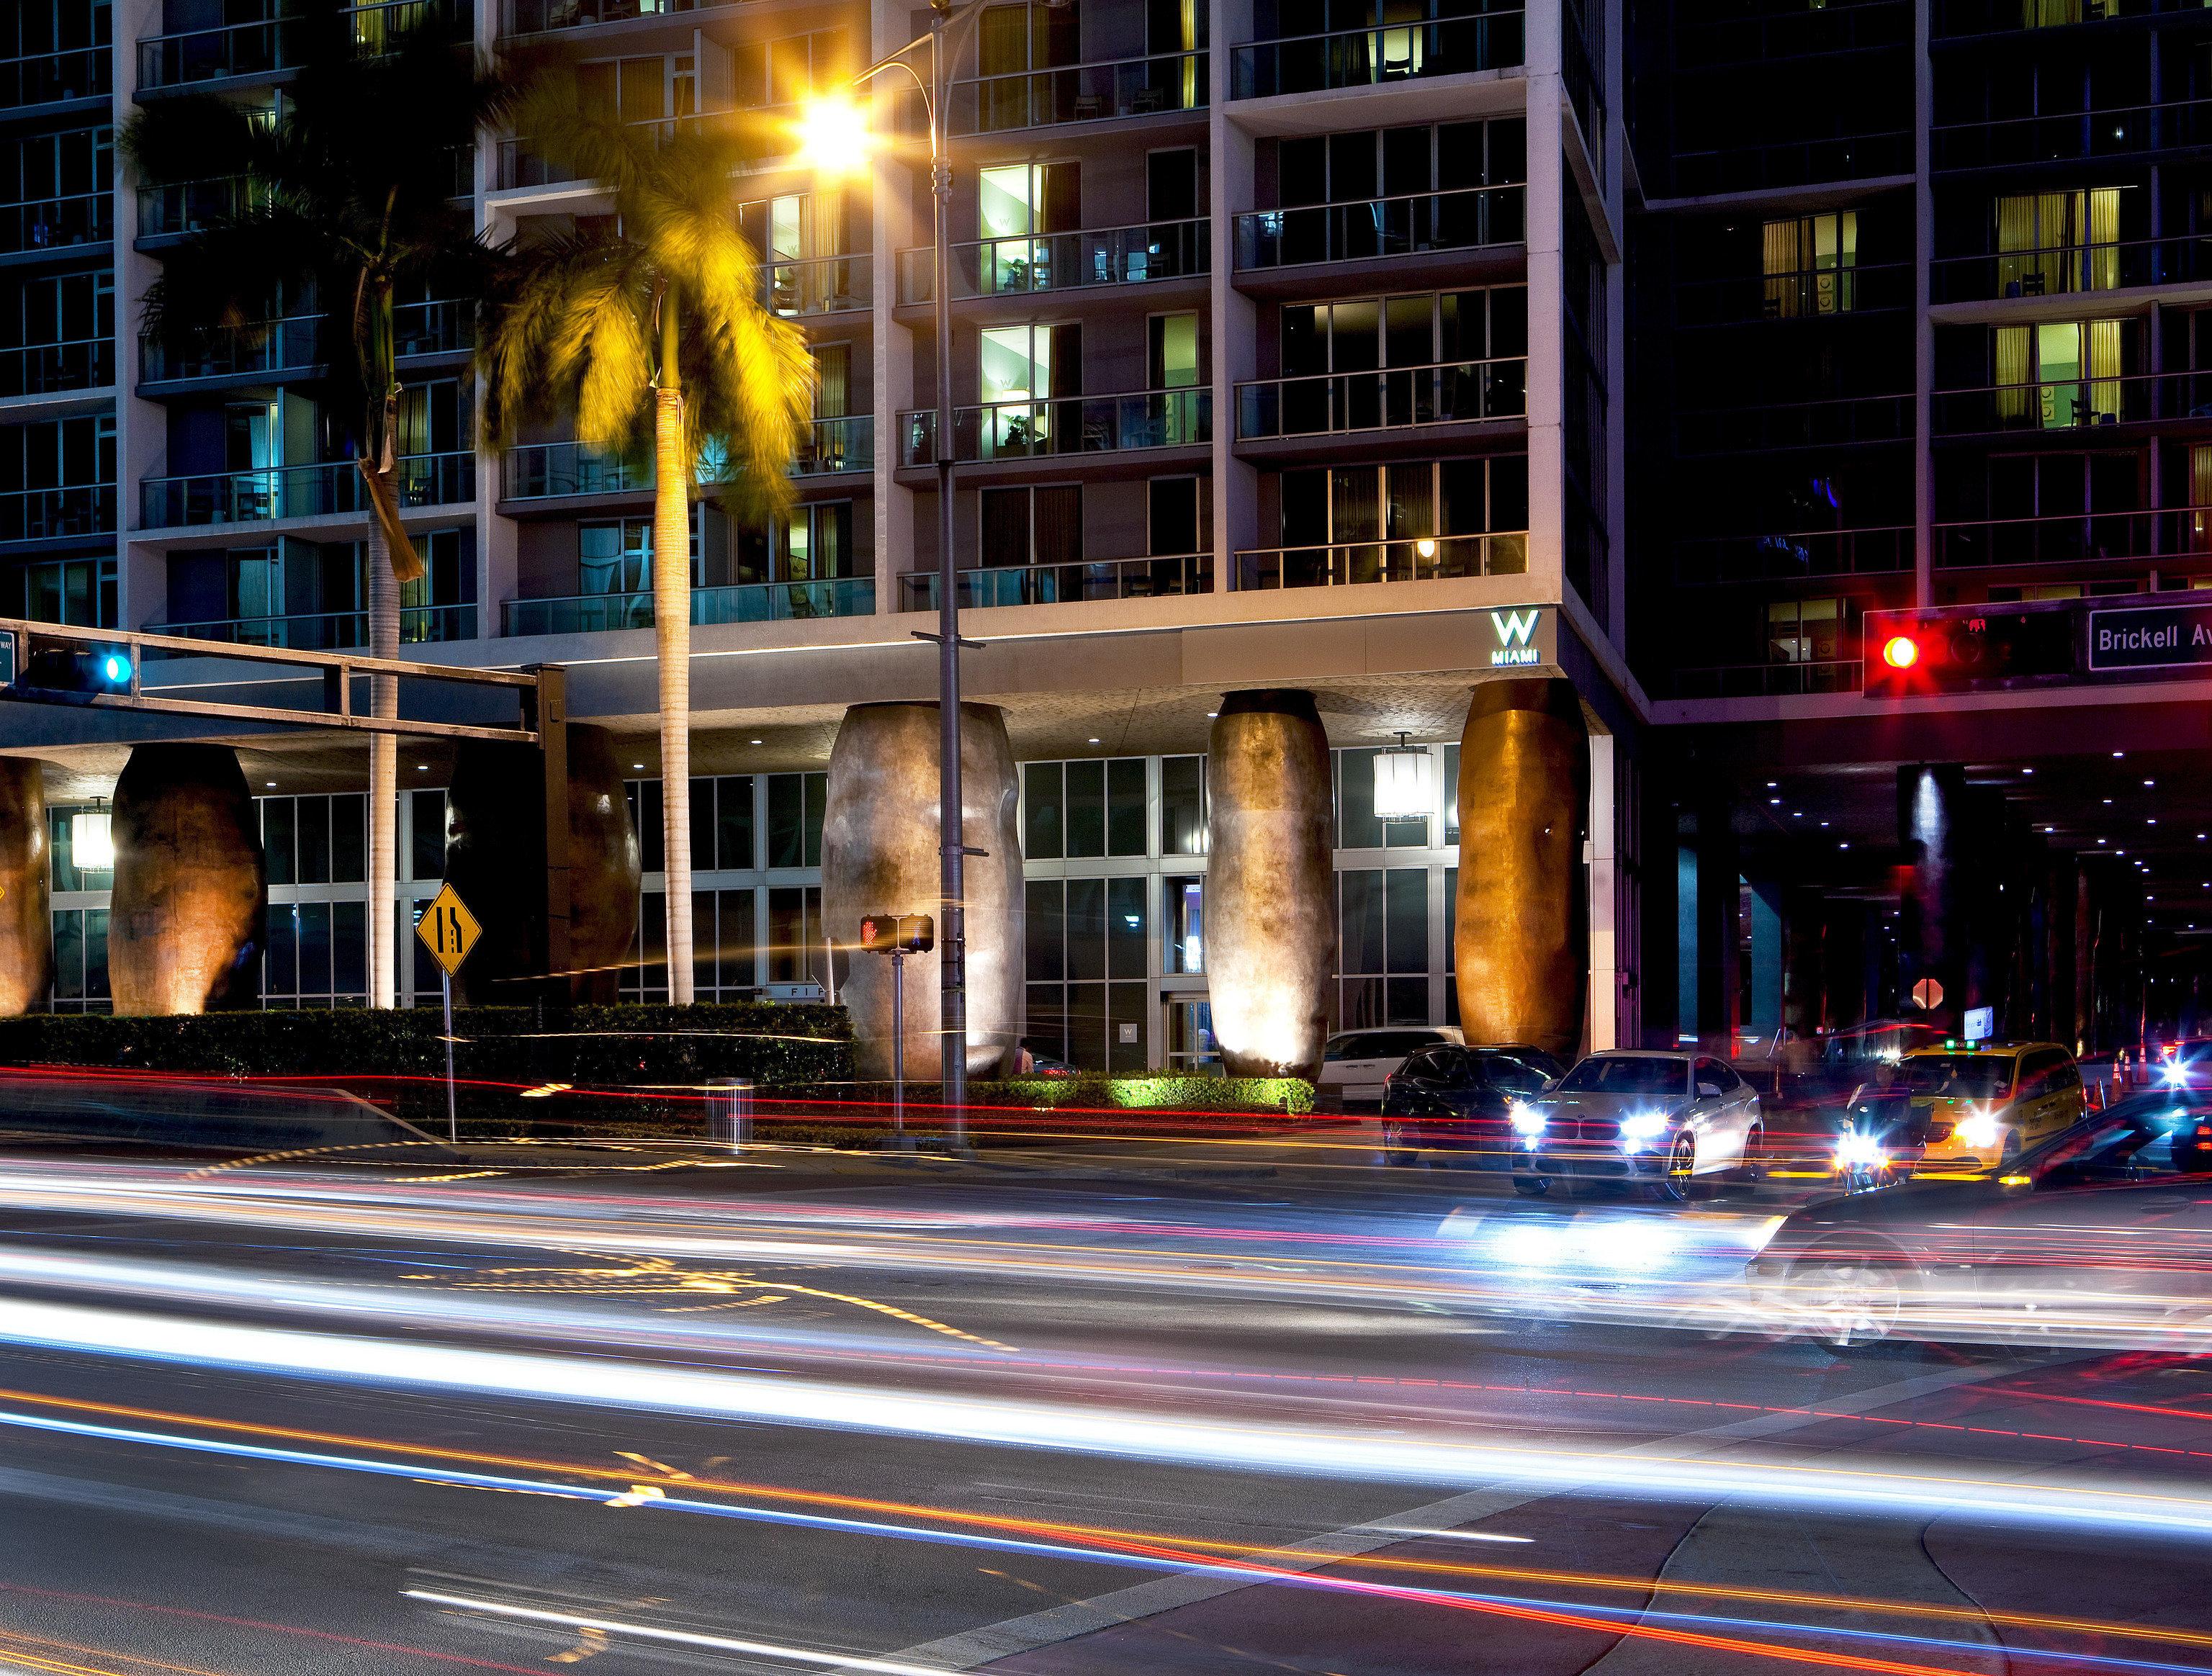 building road metropolitan area street night City metropolis cityscape lane light evening Downtown traffic lighting pedestrian skyscraper